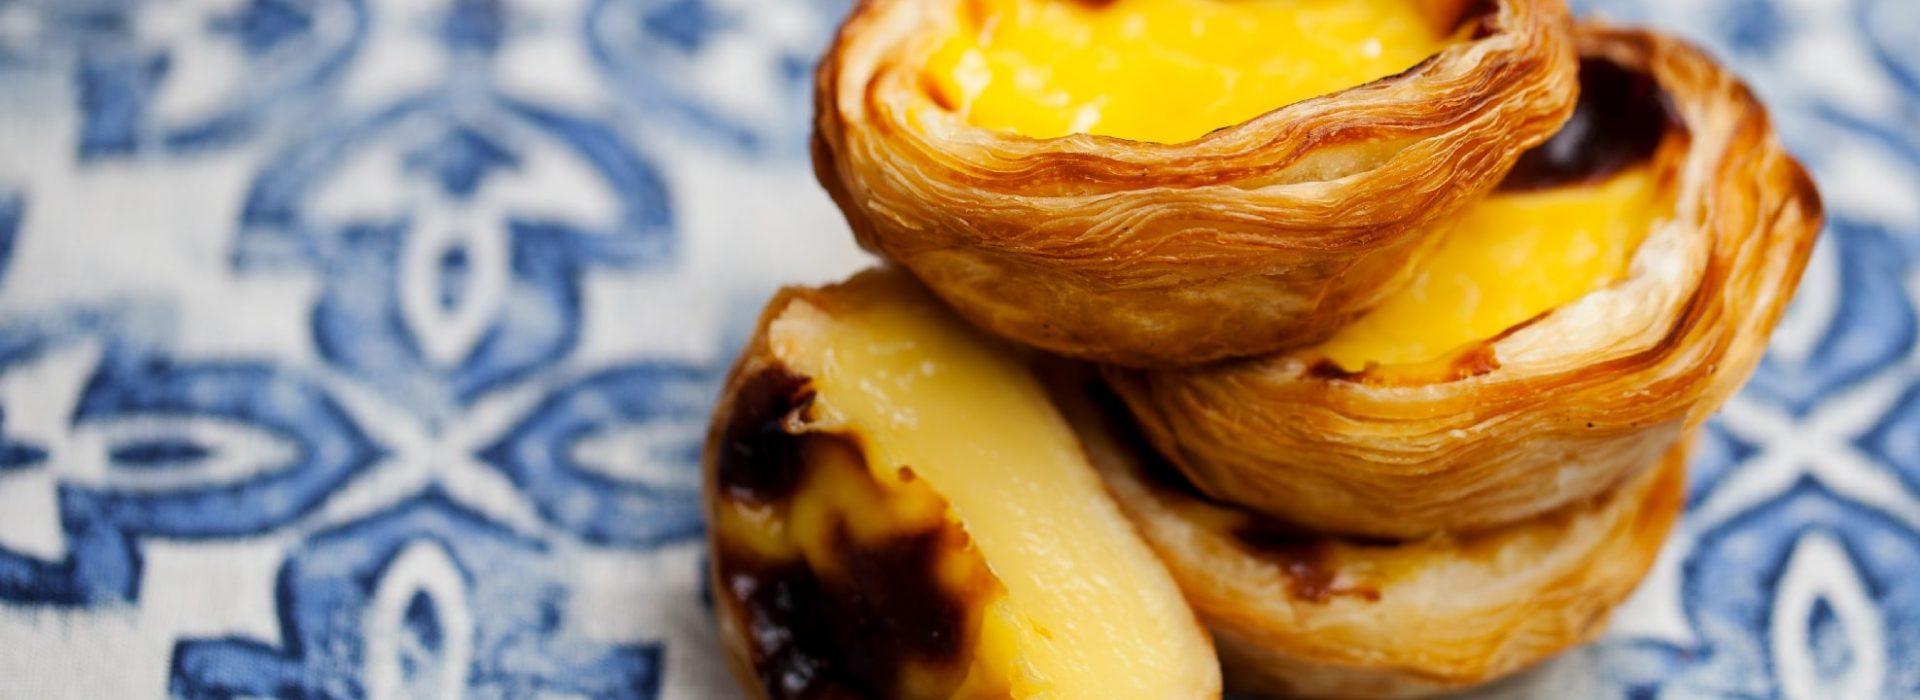 Portuguese Desserts Blog Image